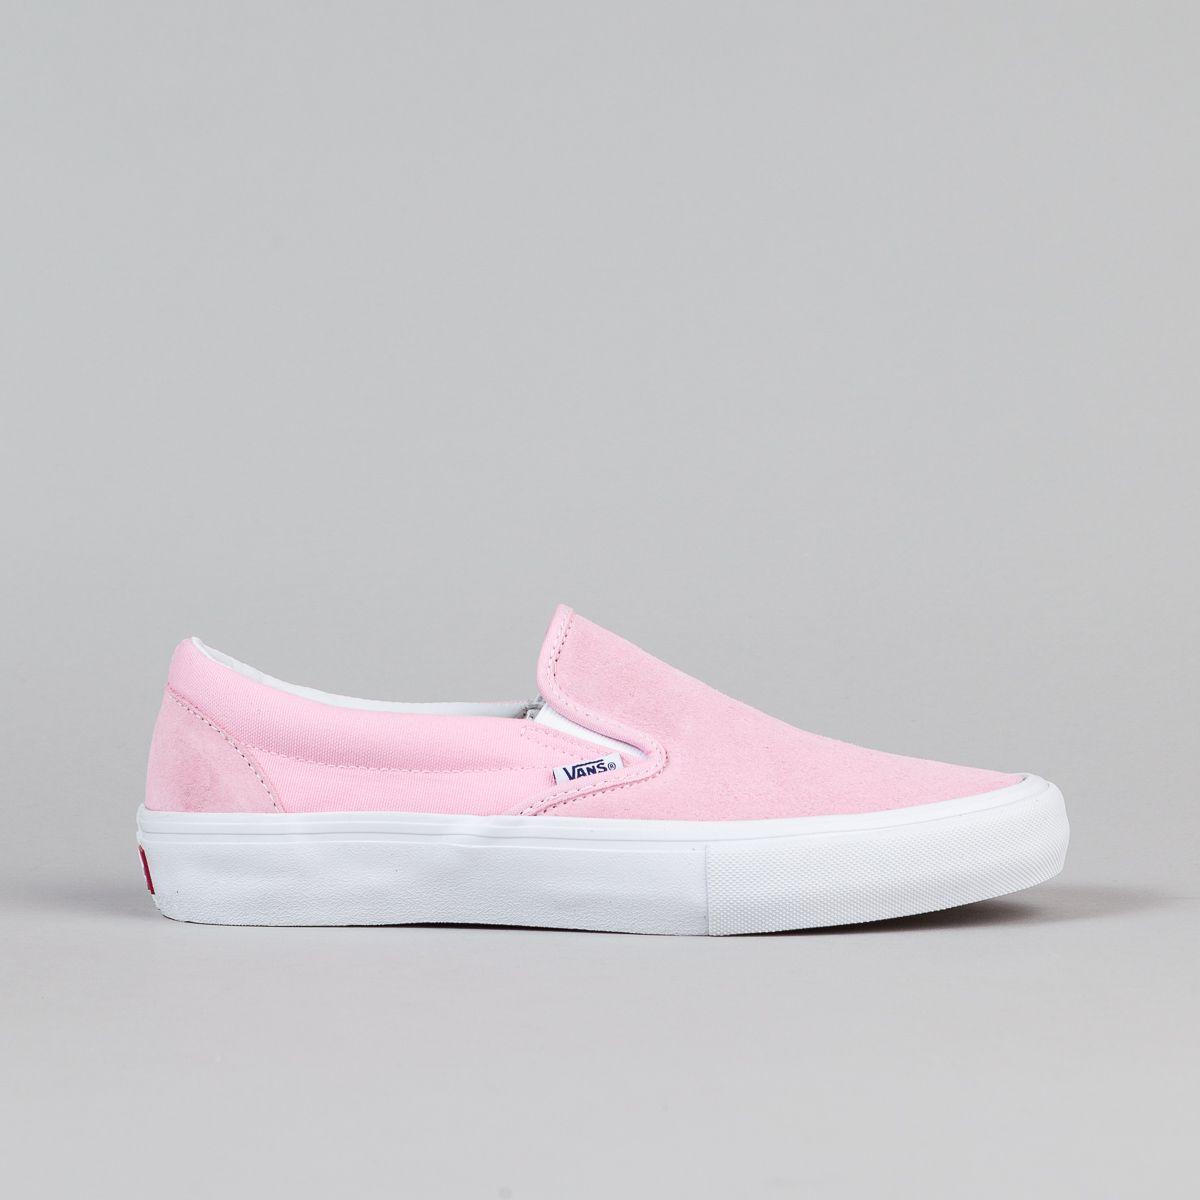 Vans Slip On Pro Shoes Candy Pink White Vans Slip On Vans Slip On Pro Slip On